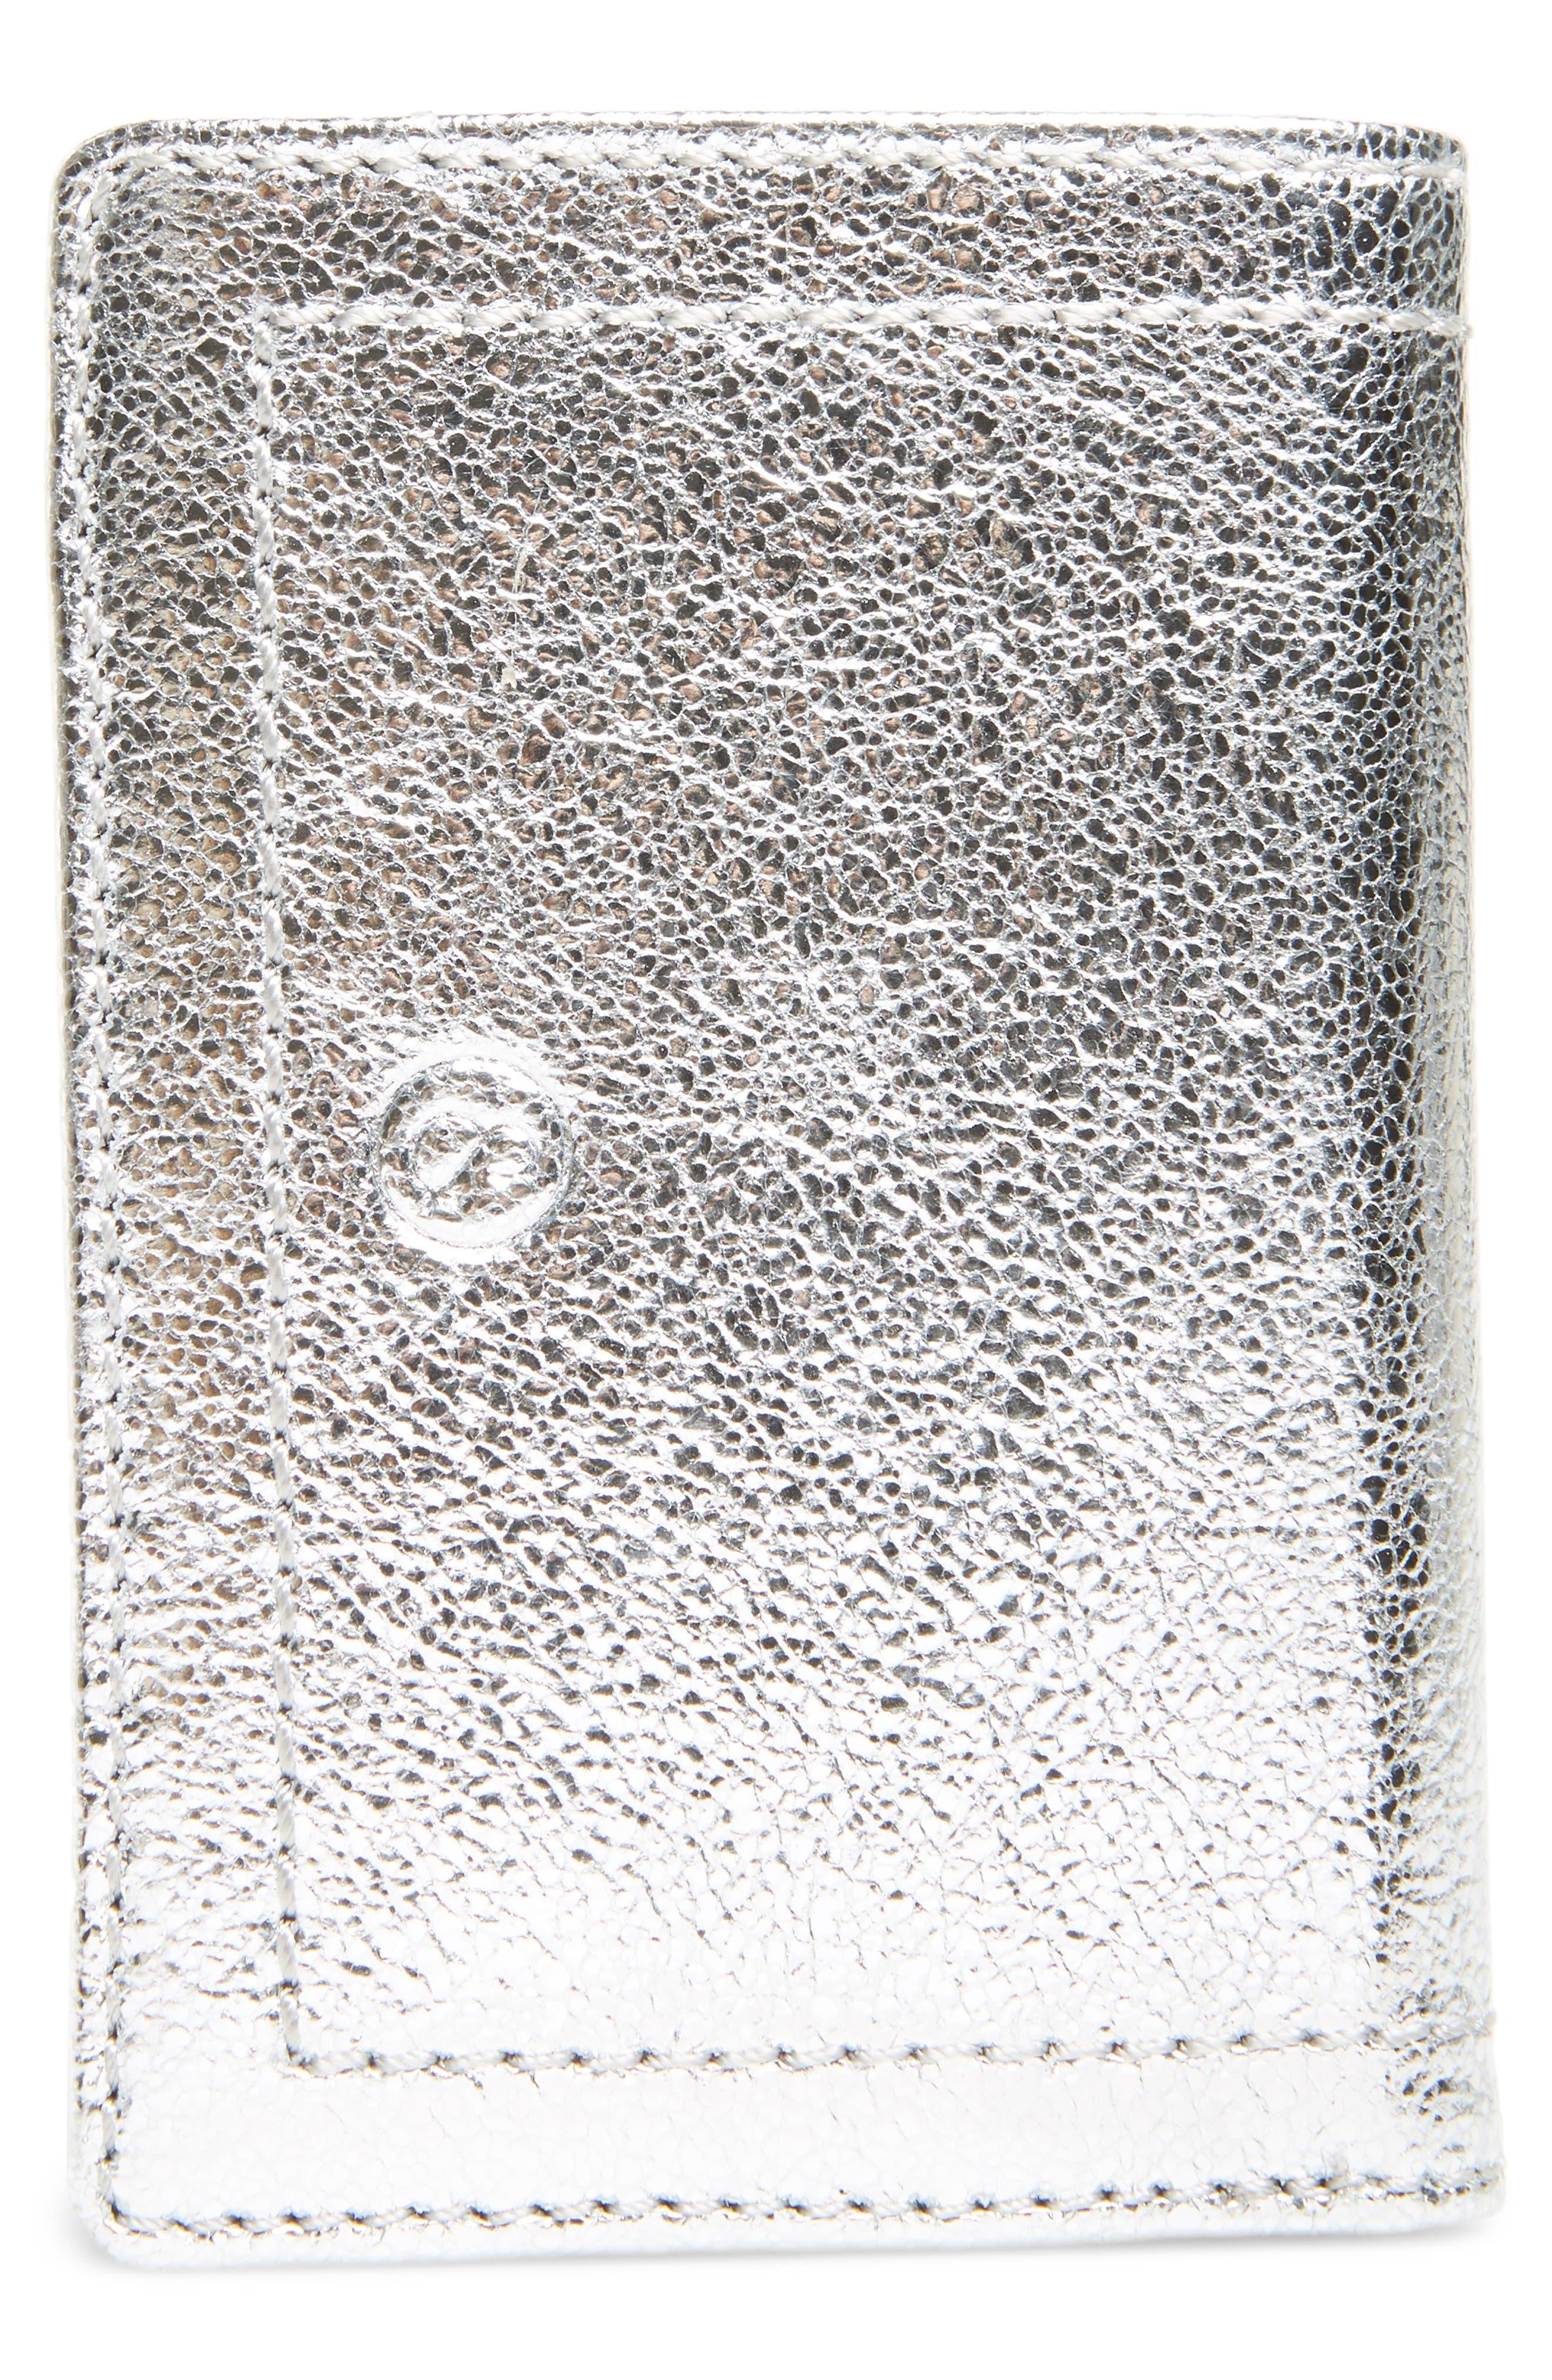 Devon Crackle Leather Card Case,                             Alternate thumbnail 2, color,                             SILVER